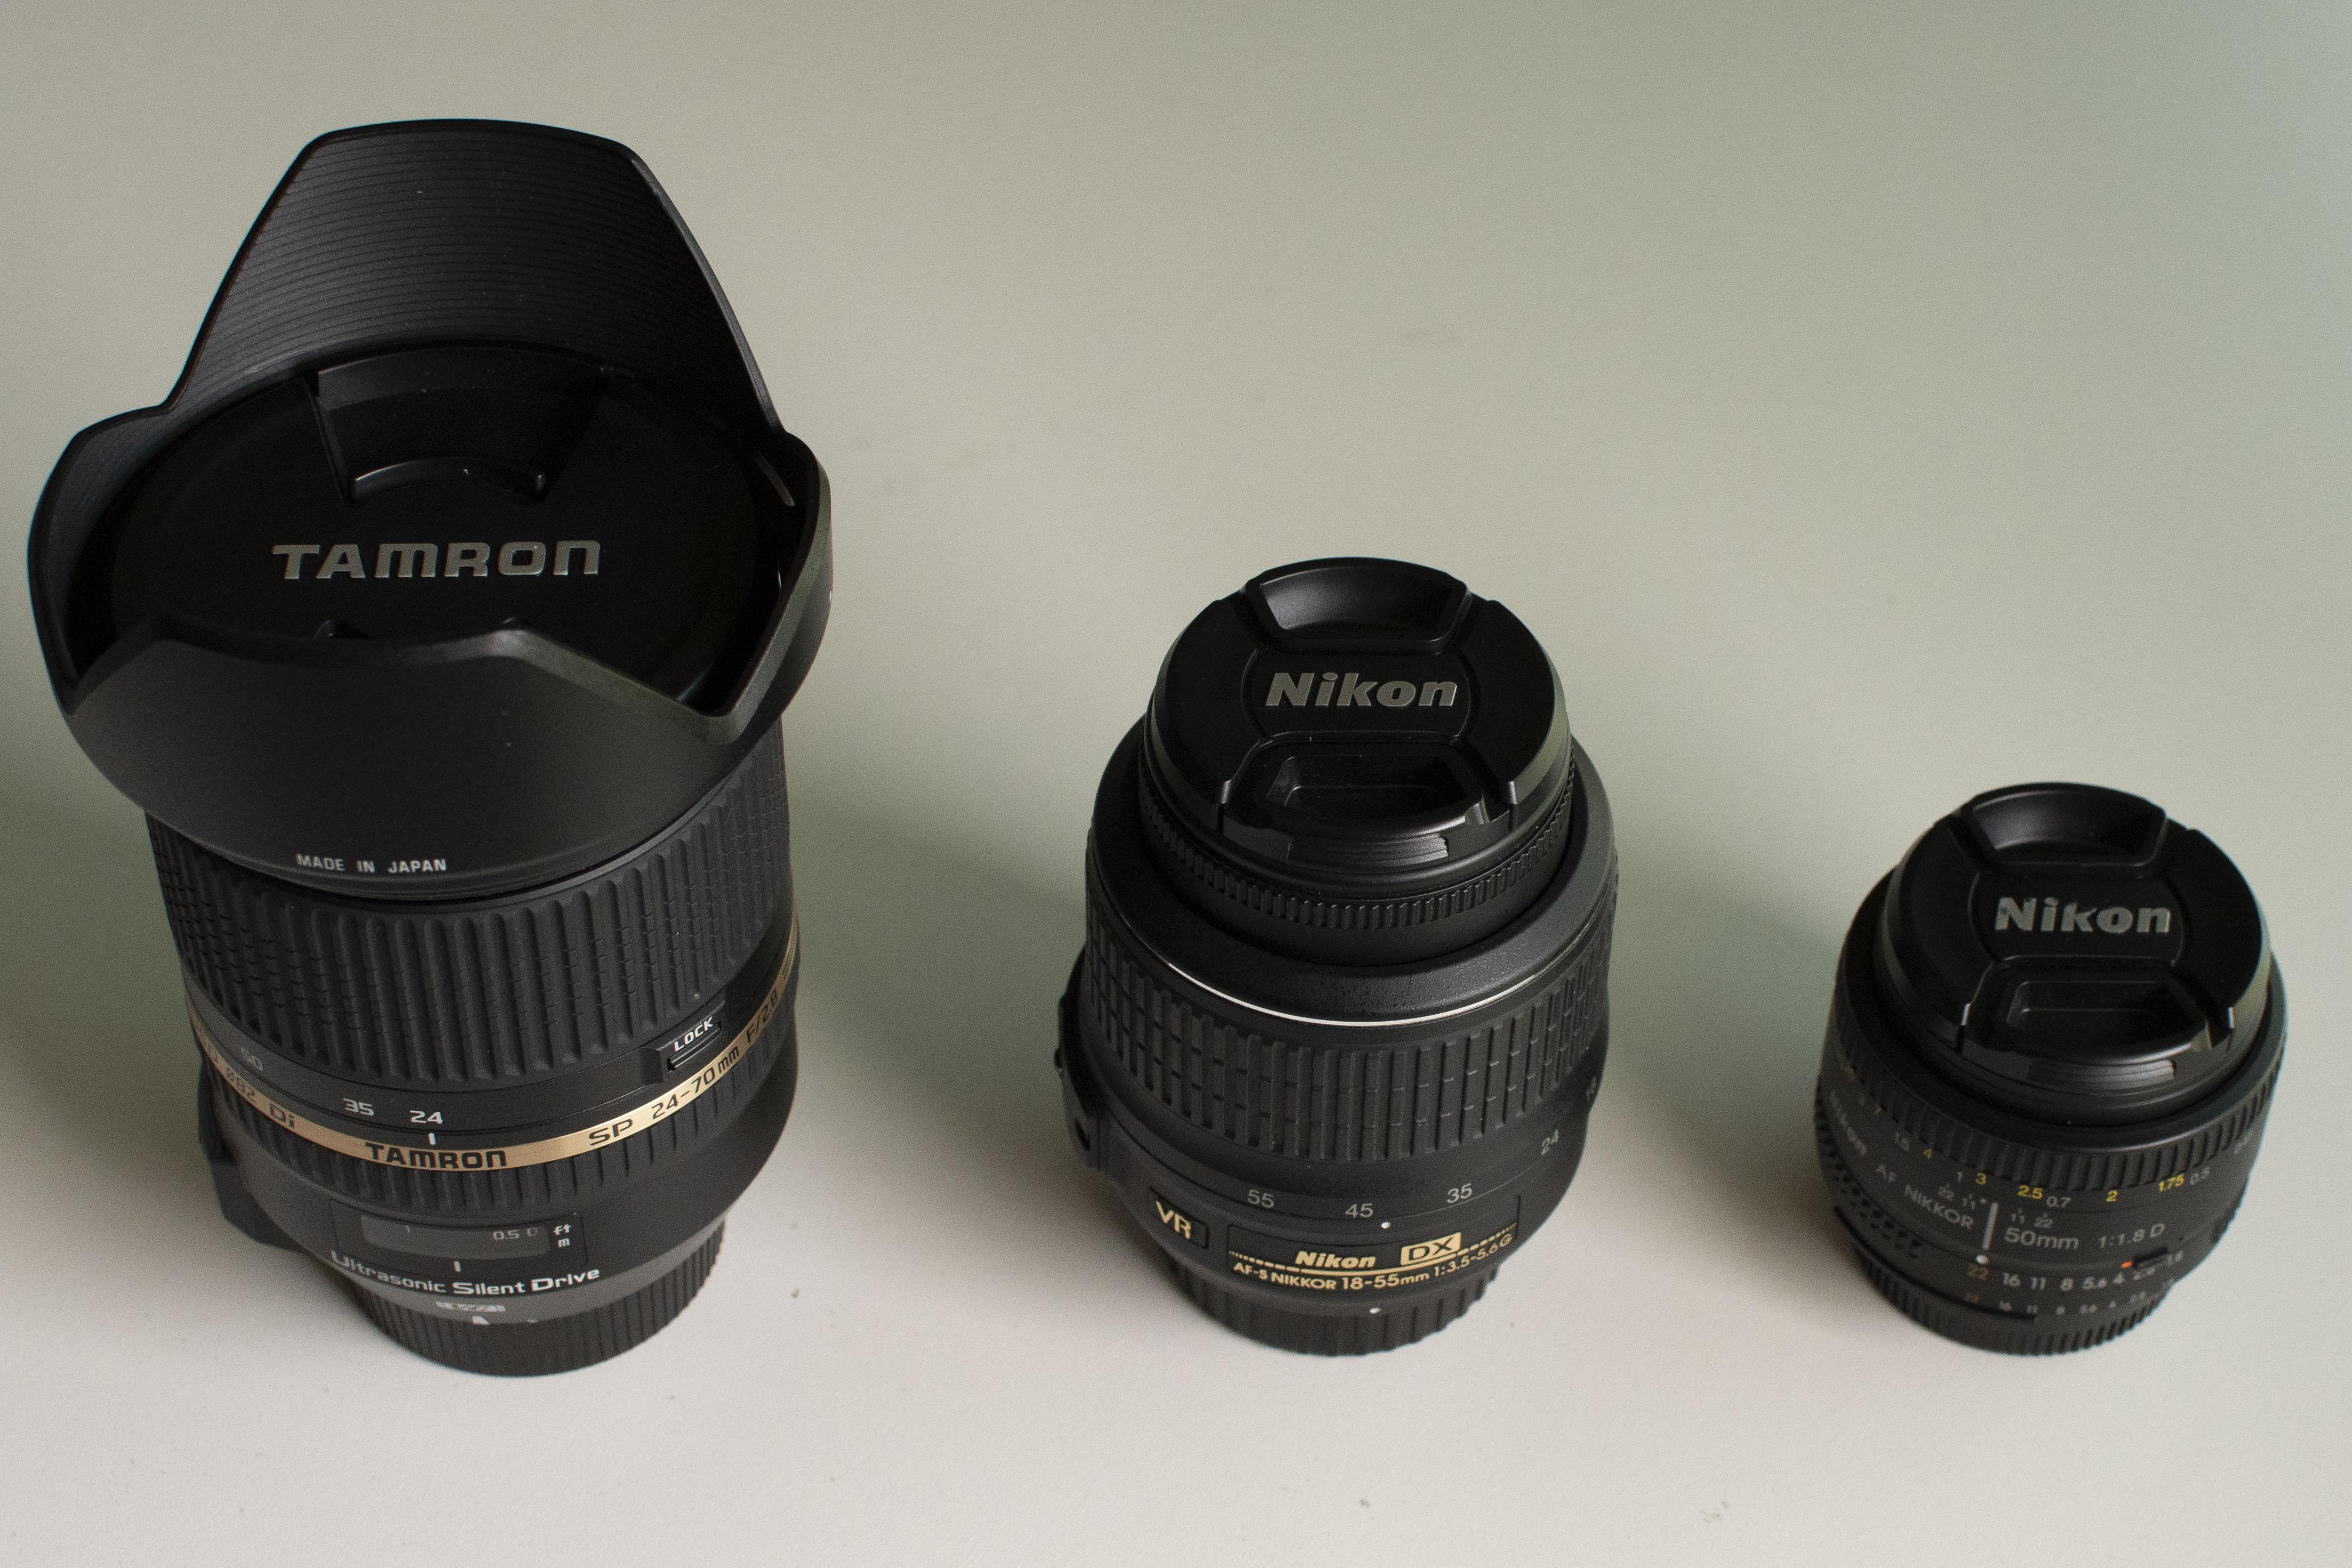 Tamron 24-70mm f/2.8 / Nikon 18-55mm f/3.5-f/5.6 / Nikon 50mm f/1.8 Lenses